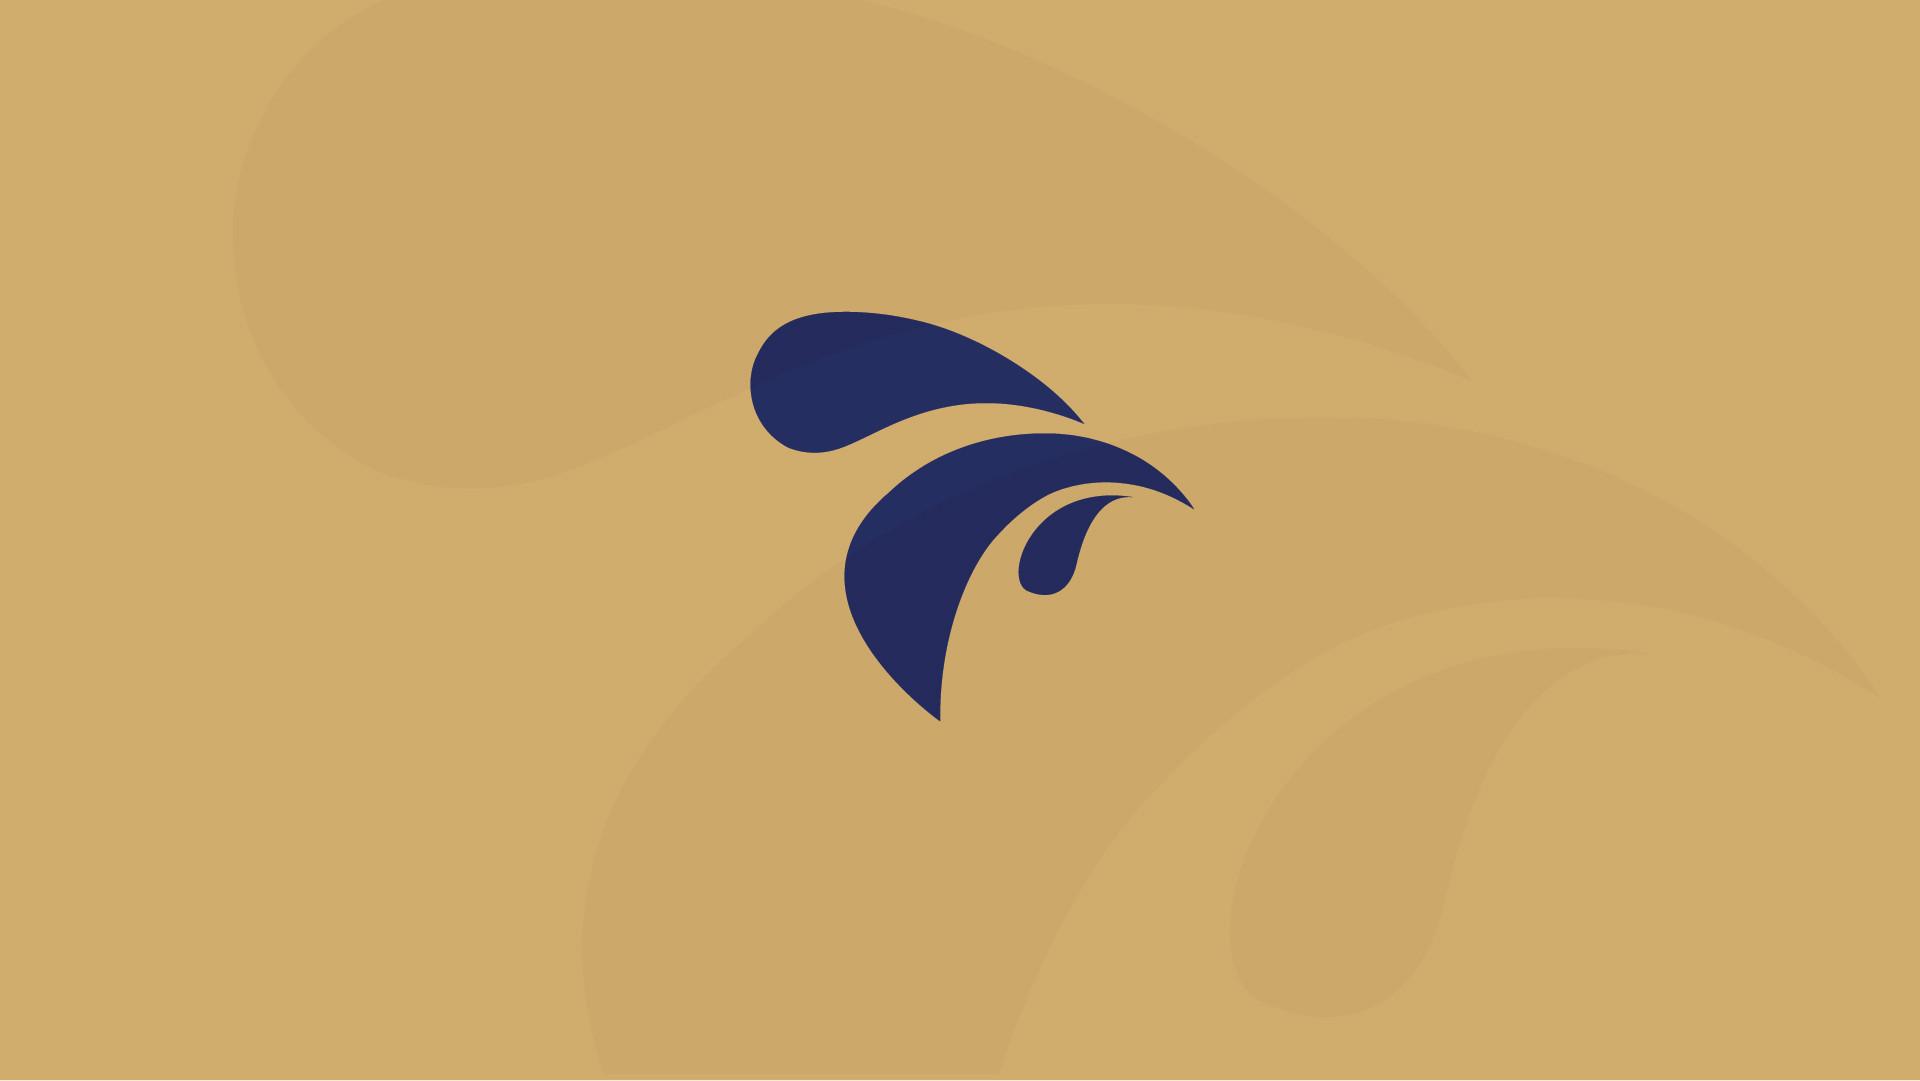 img-portfolio-portogallo-voadora (4).jpg